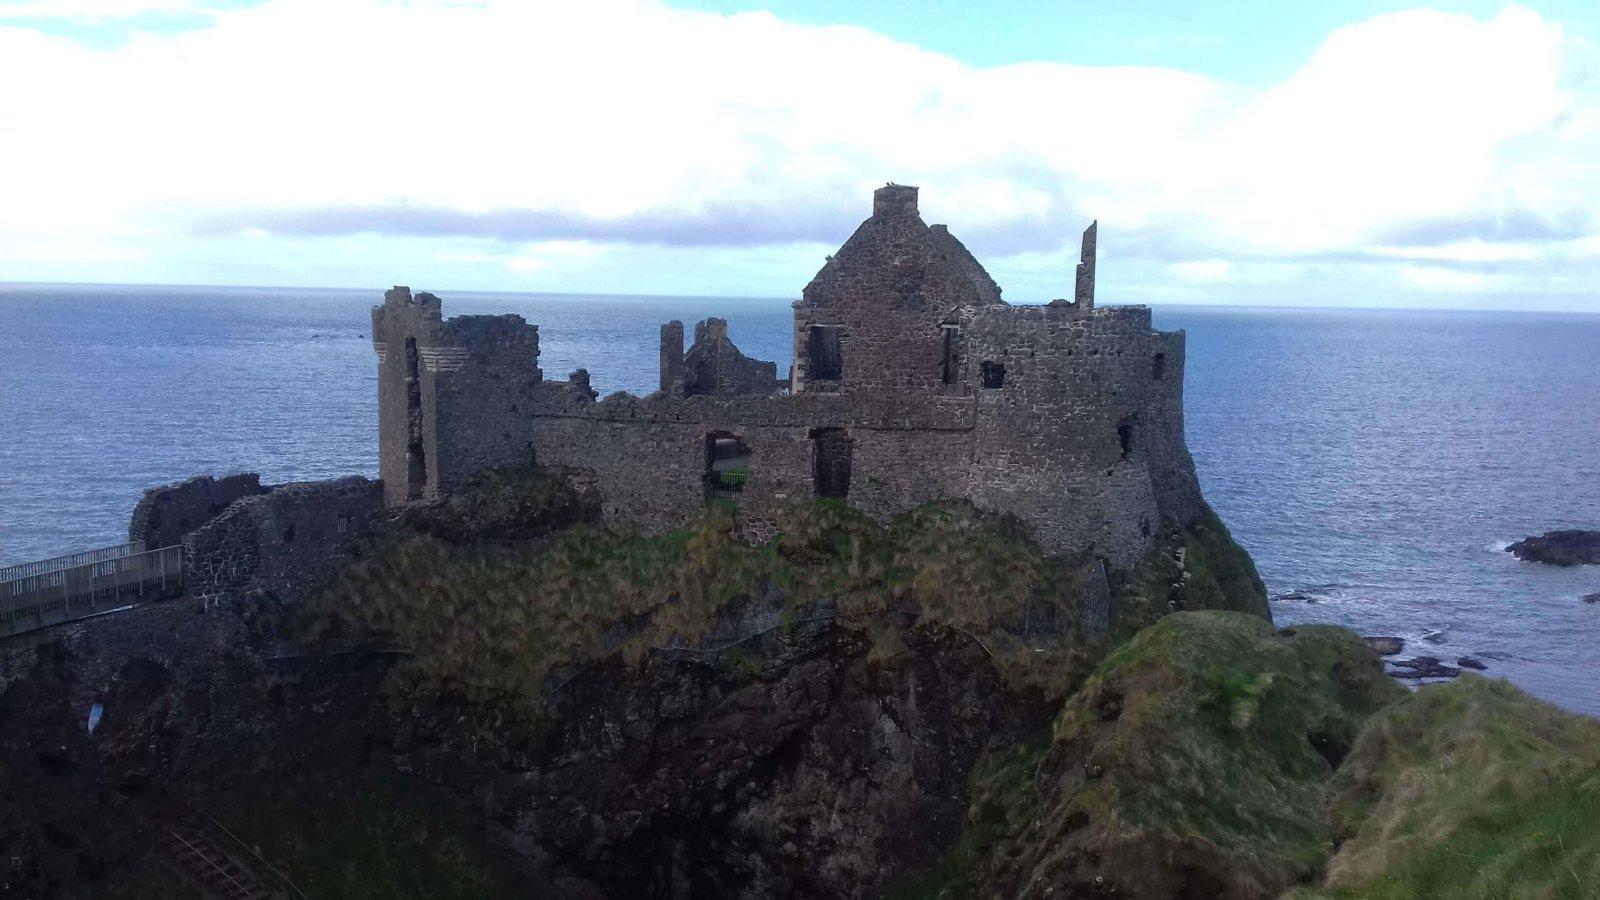 Prolaz divova i dvorac Dunluce